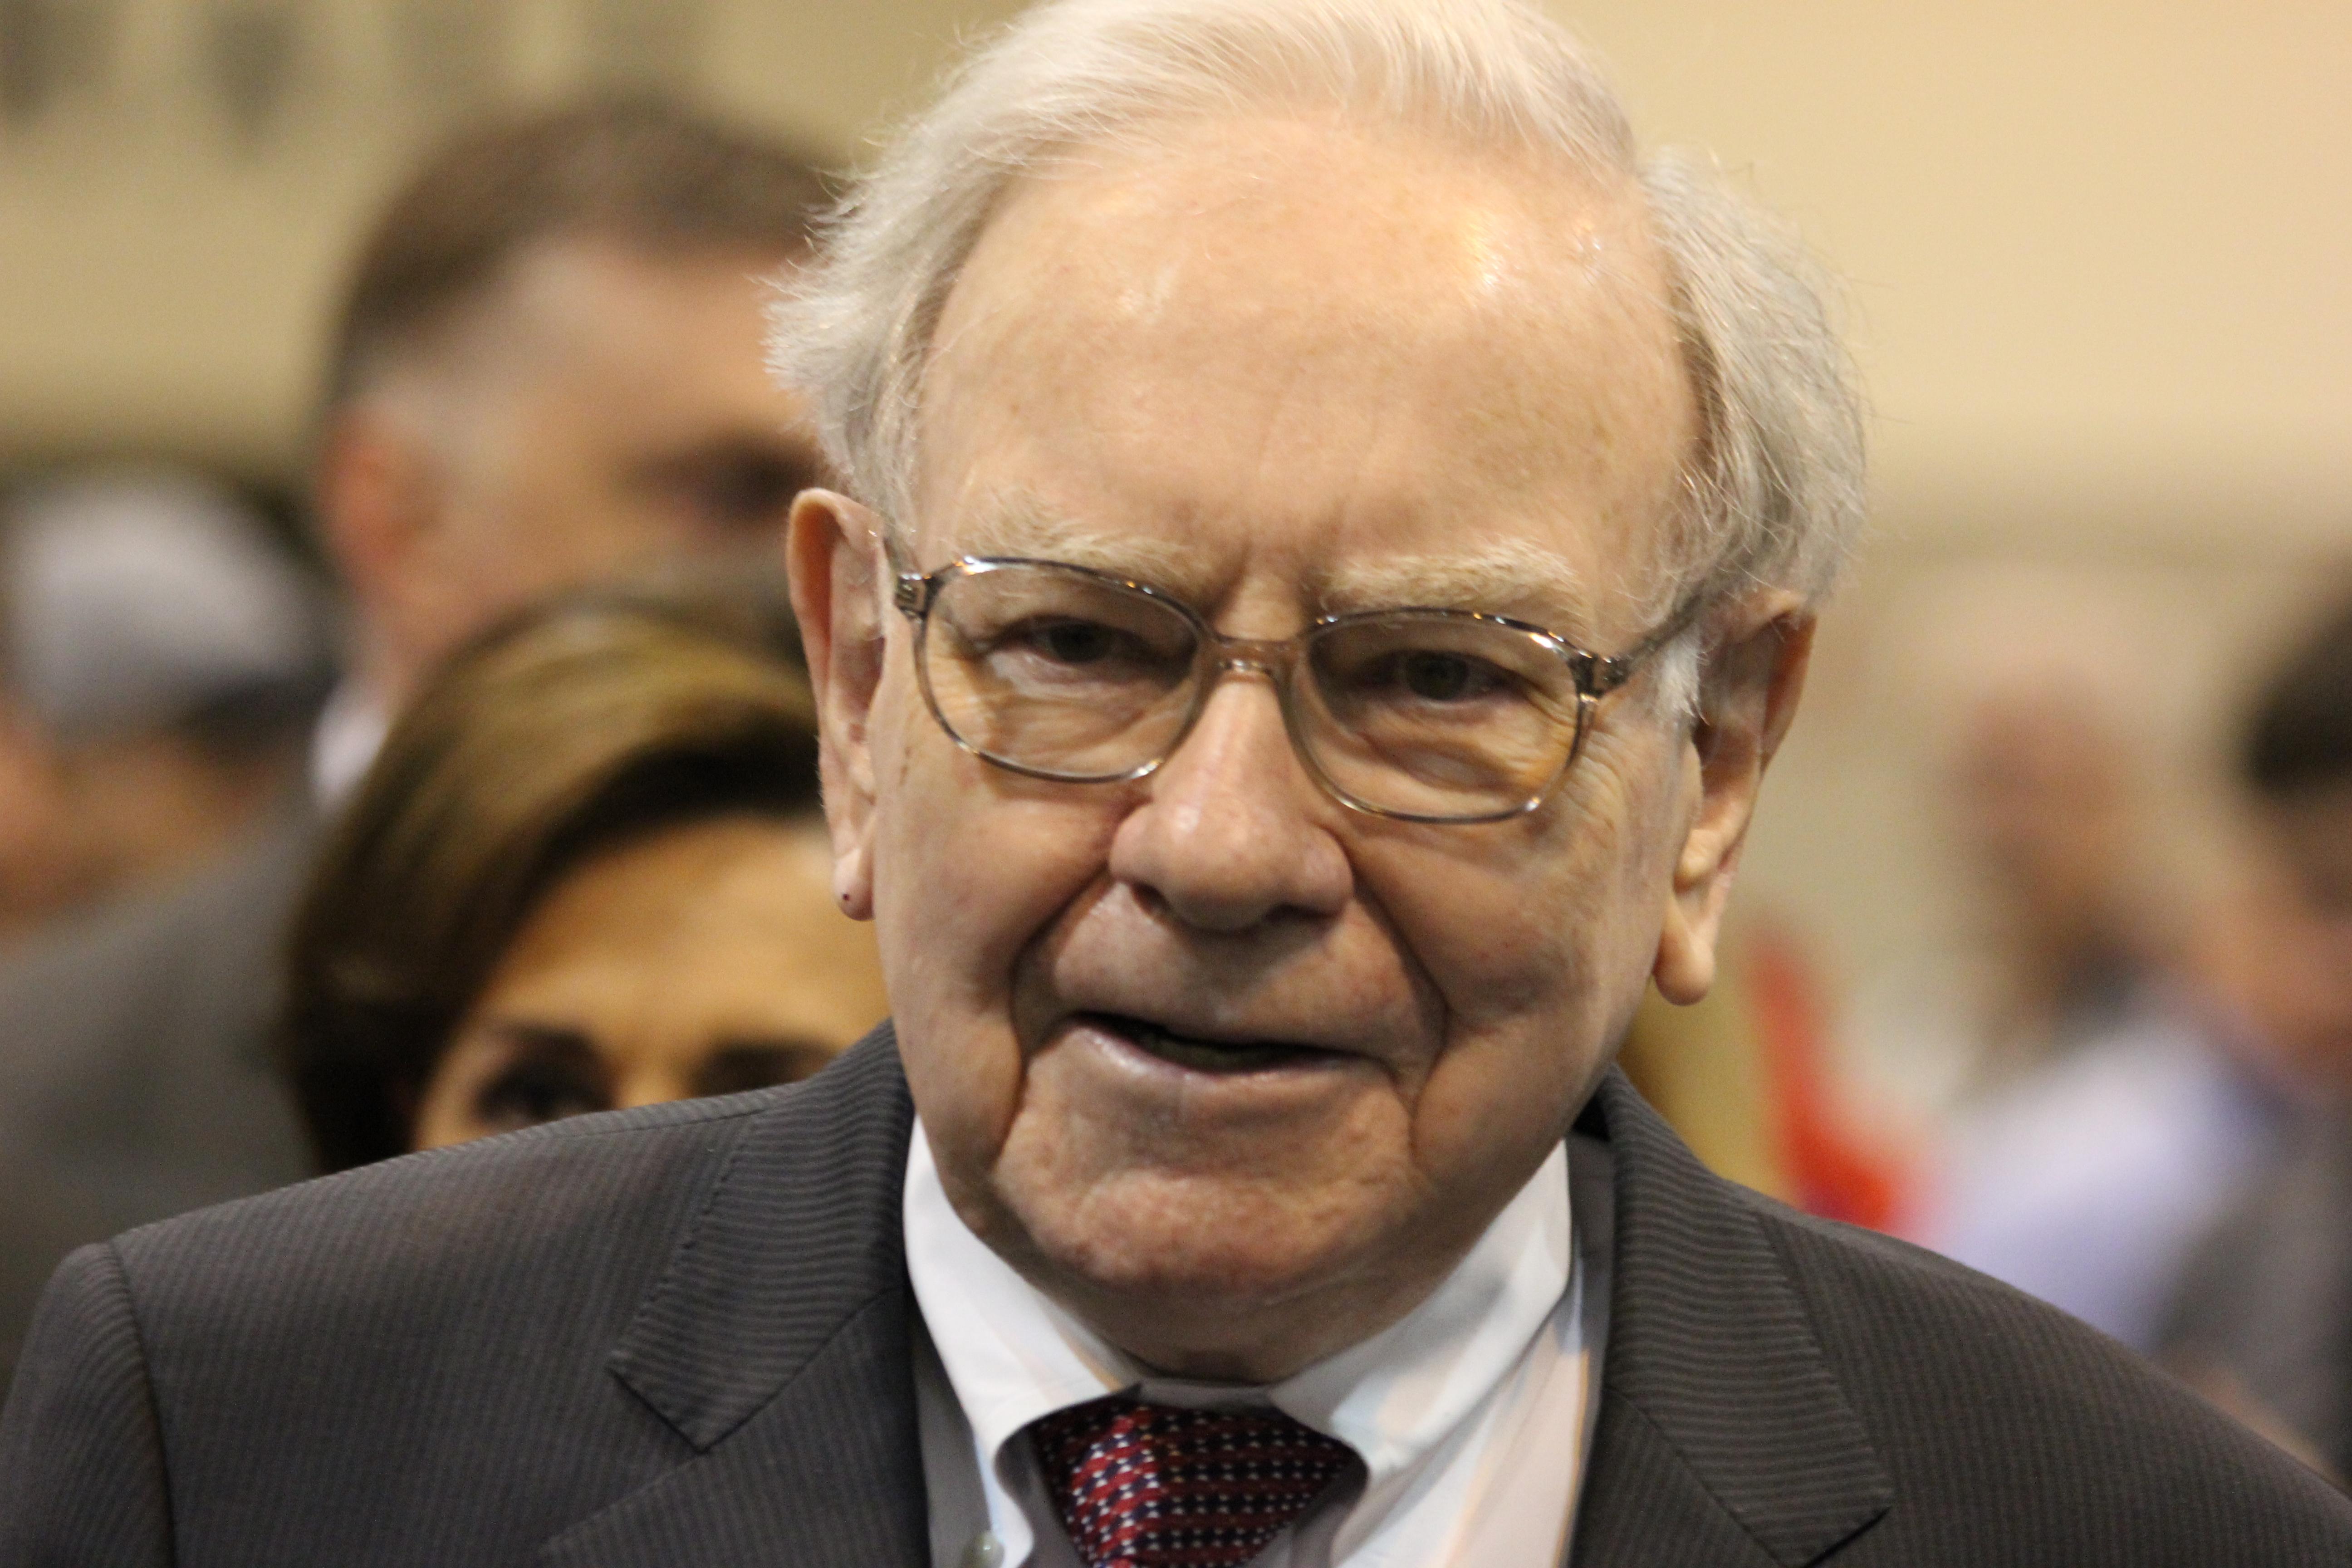 Warren Buffett at Berkshire Hathaway's annual meeting